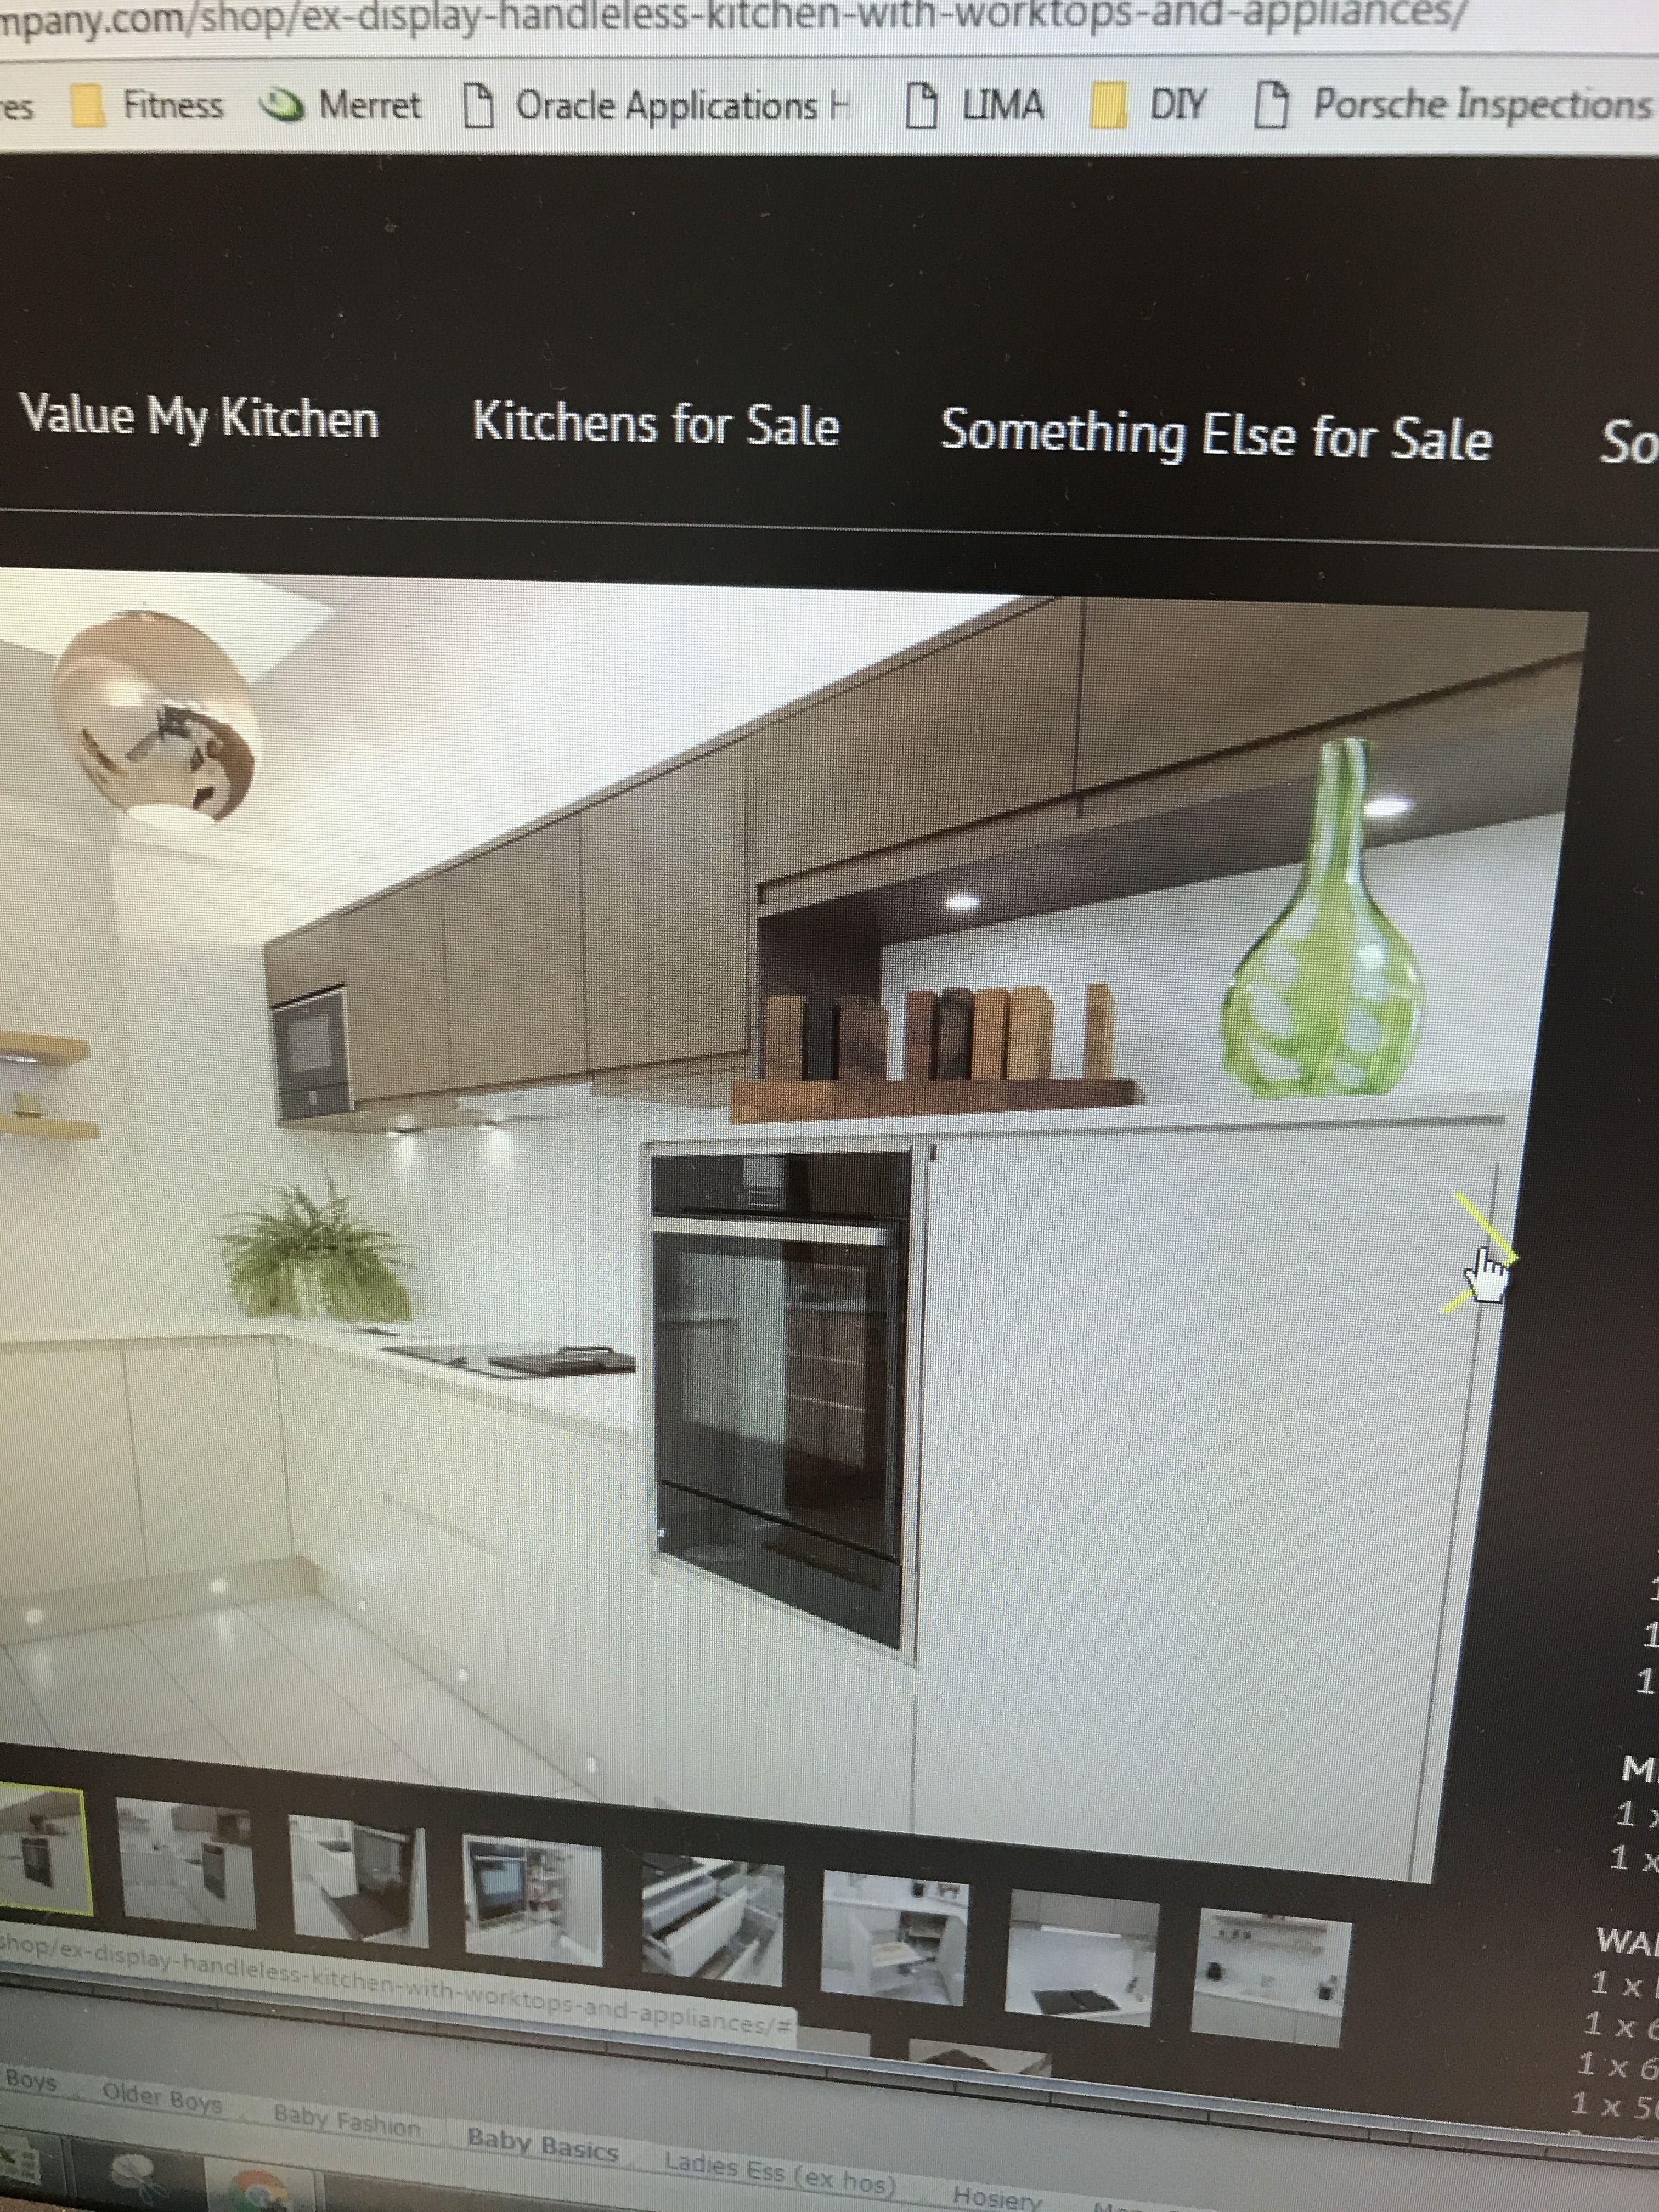 Pin by Matt Barnes on Kitchen | Kitchen sale, Handleless ...